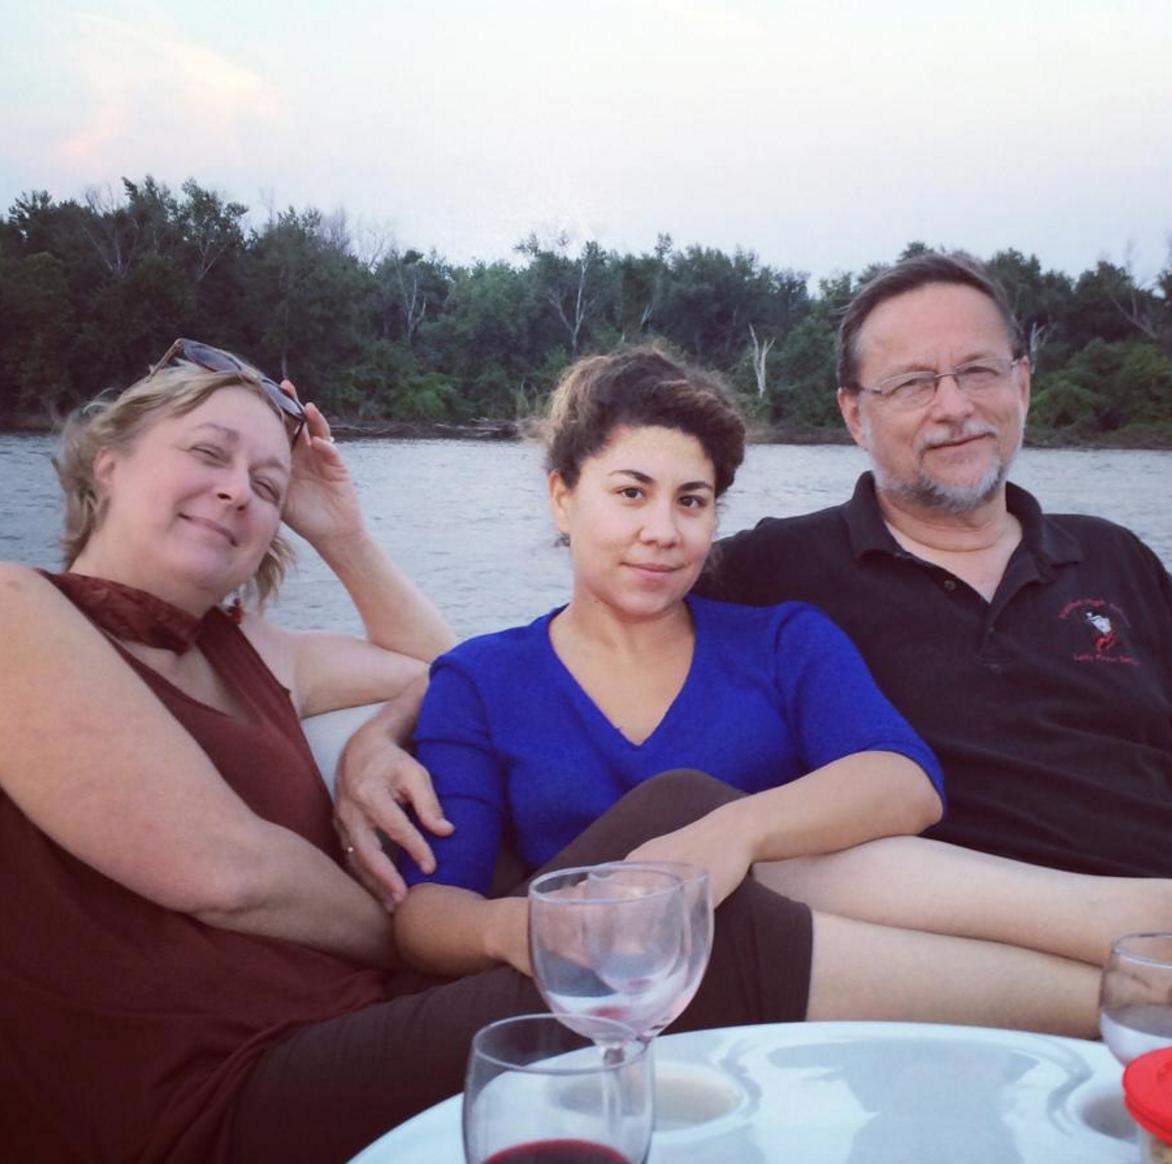 FEATURED MULTIRACIAL INDIVIDUAL: MEET SANTANA DEMPSEY via Swirl Nation Blog